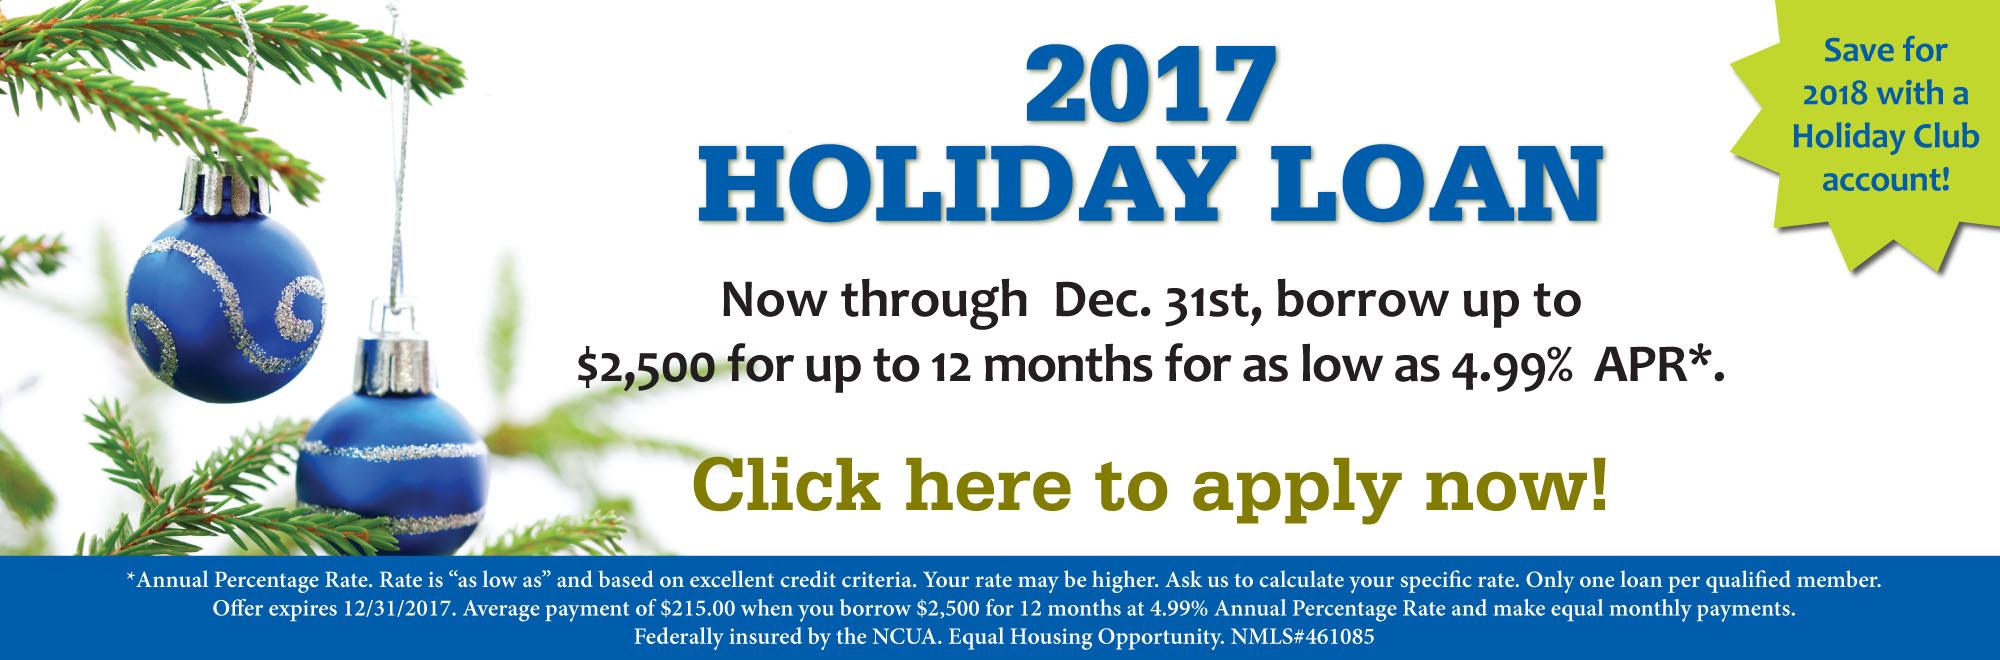 2017 Holiday Loan